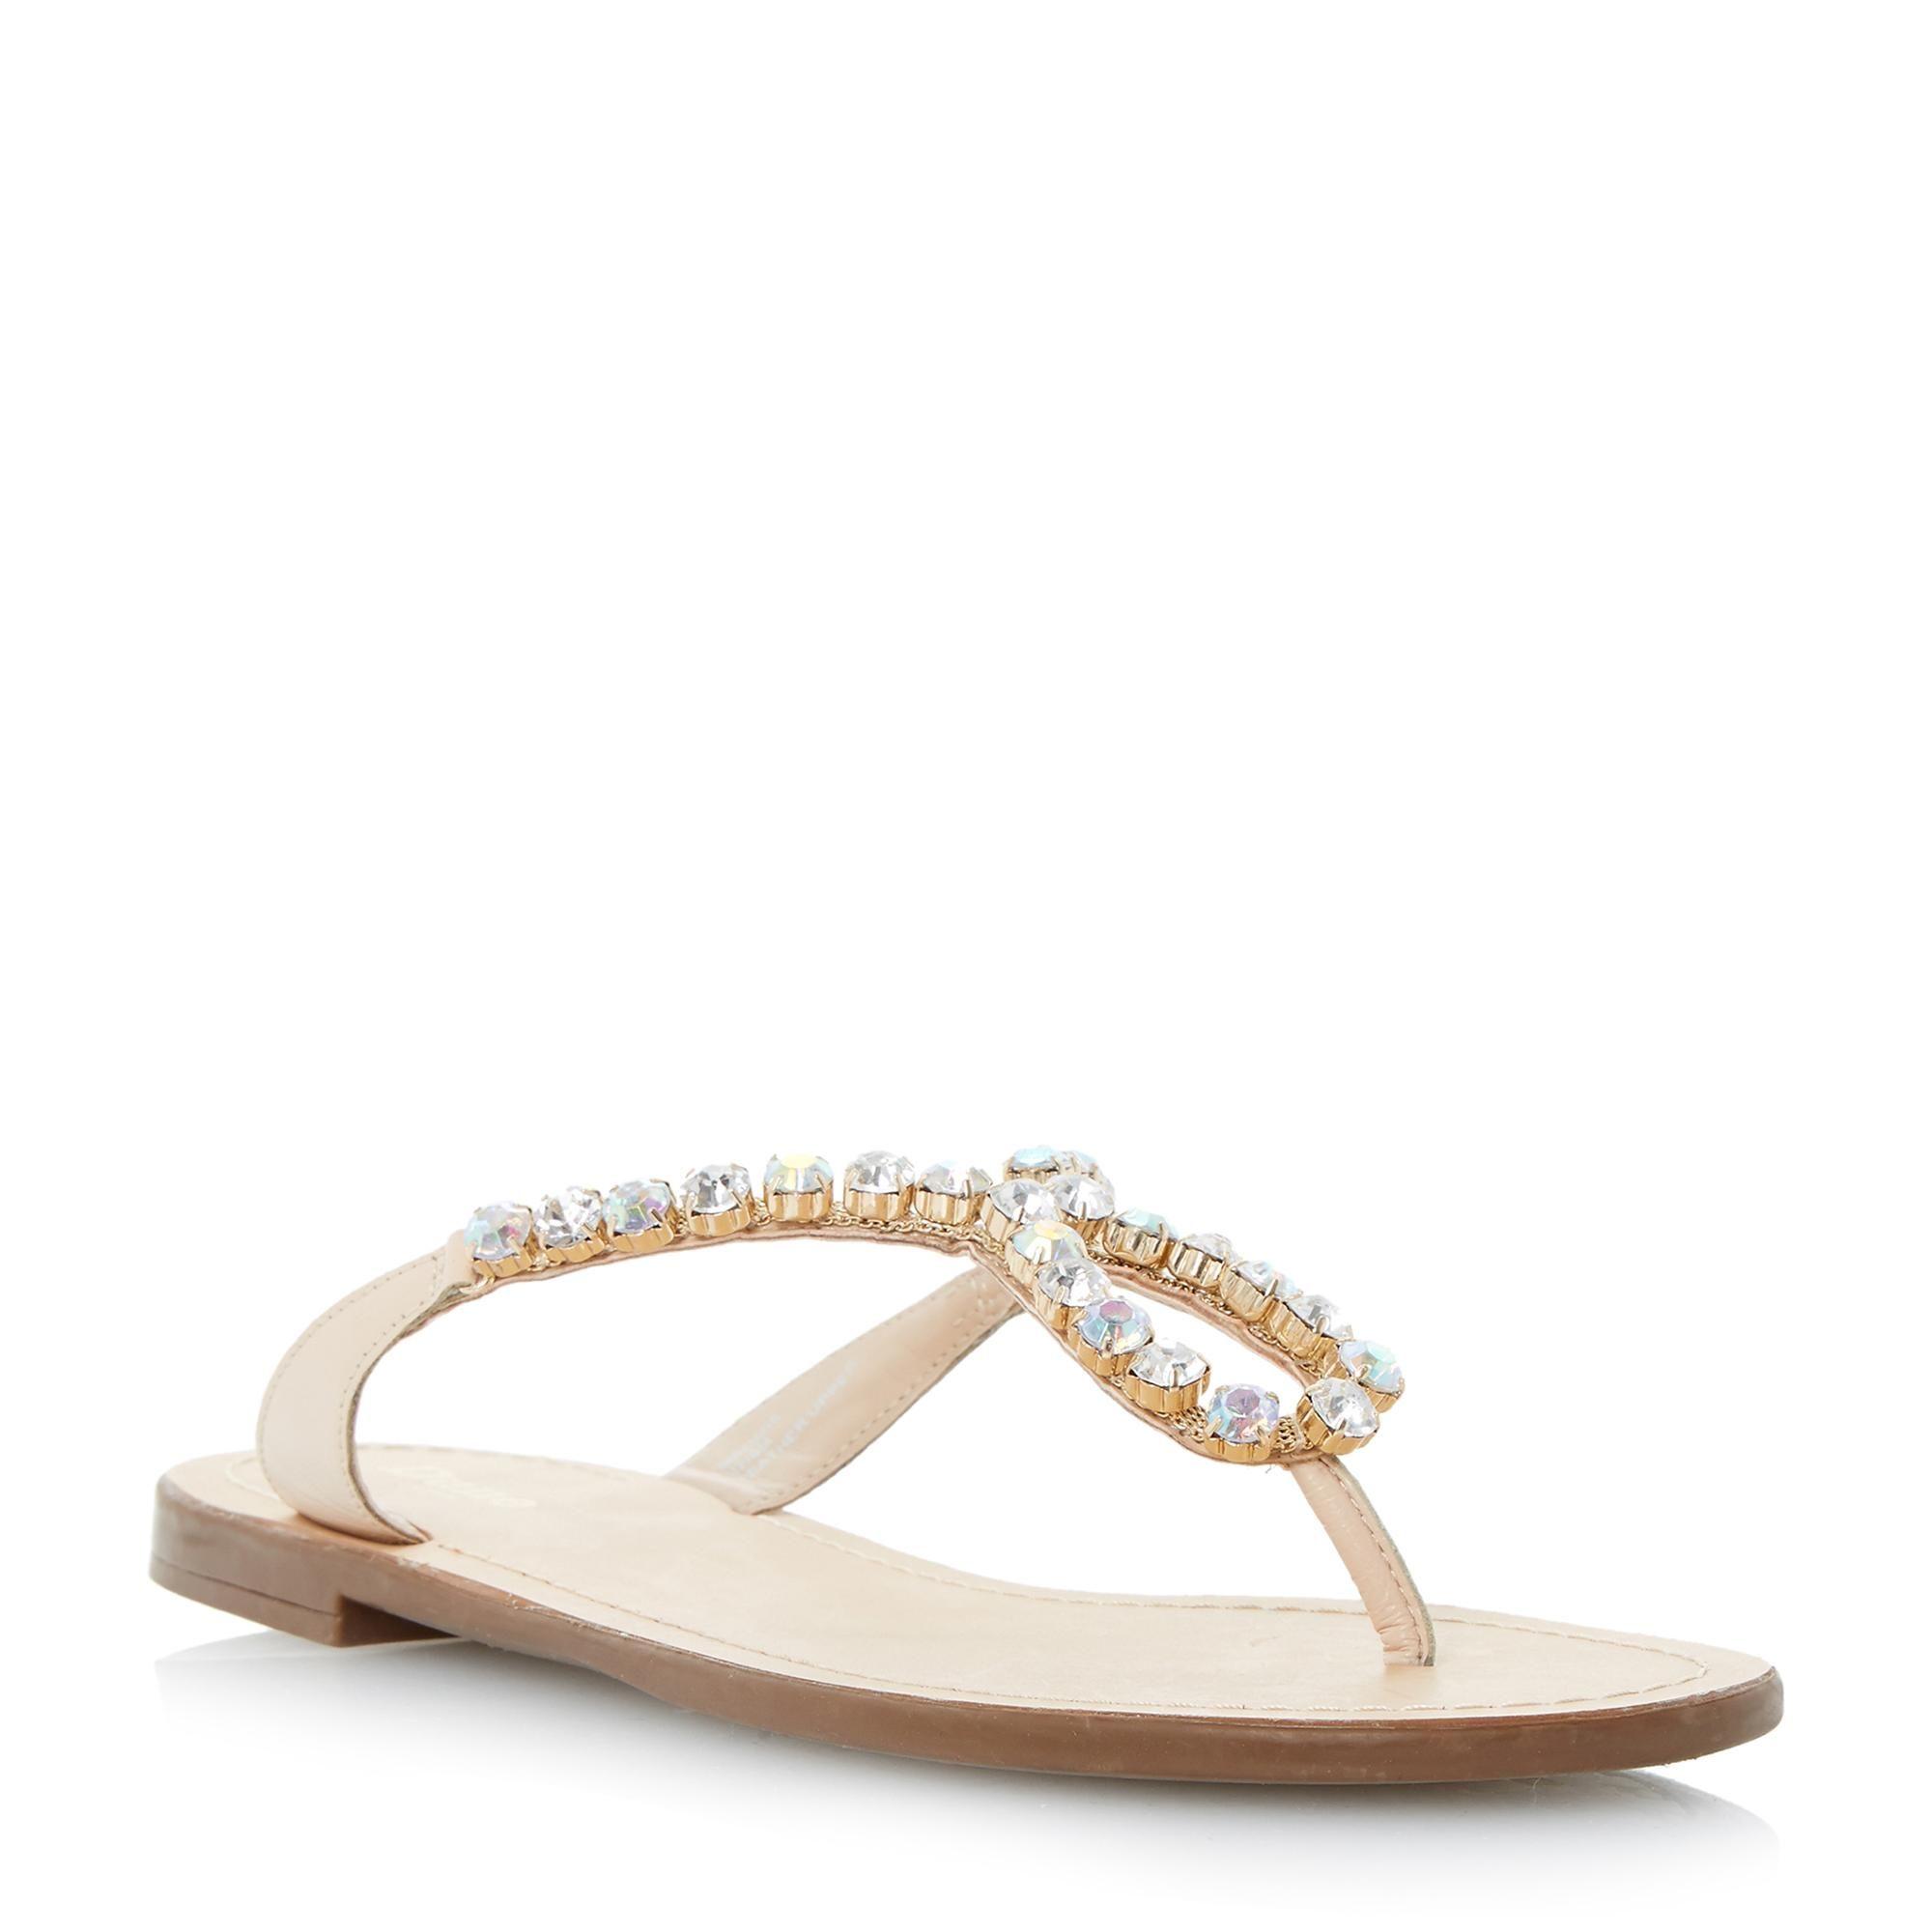 FOOTWEAR - Toe post sandals Dune London kM78J